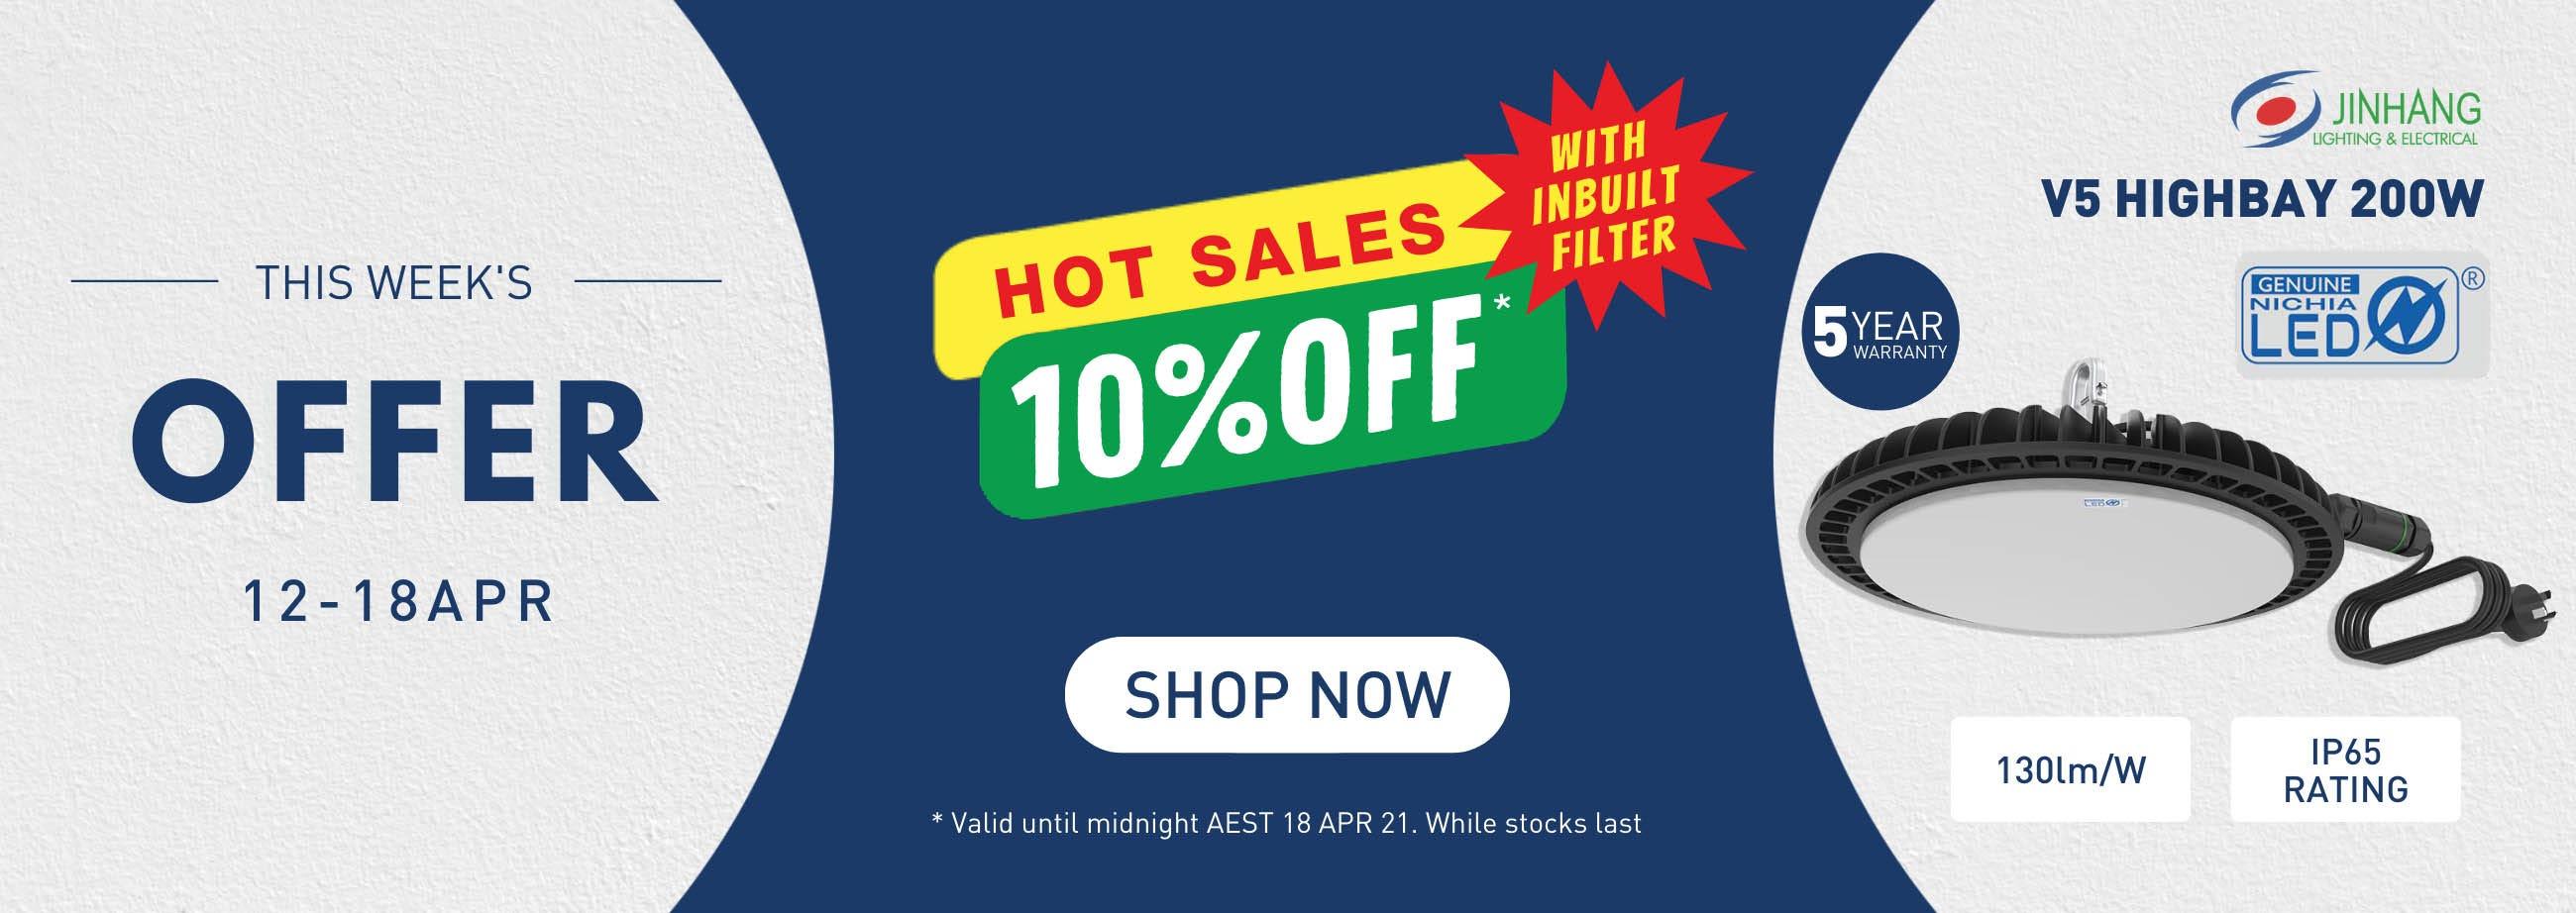 JH highbay offer 10% 12 apr